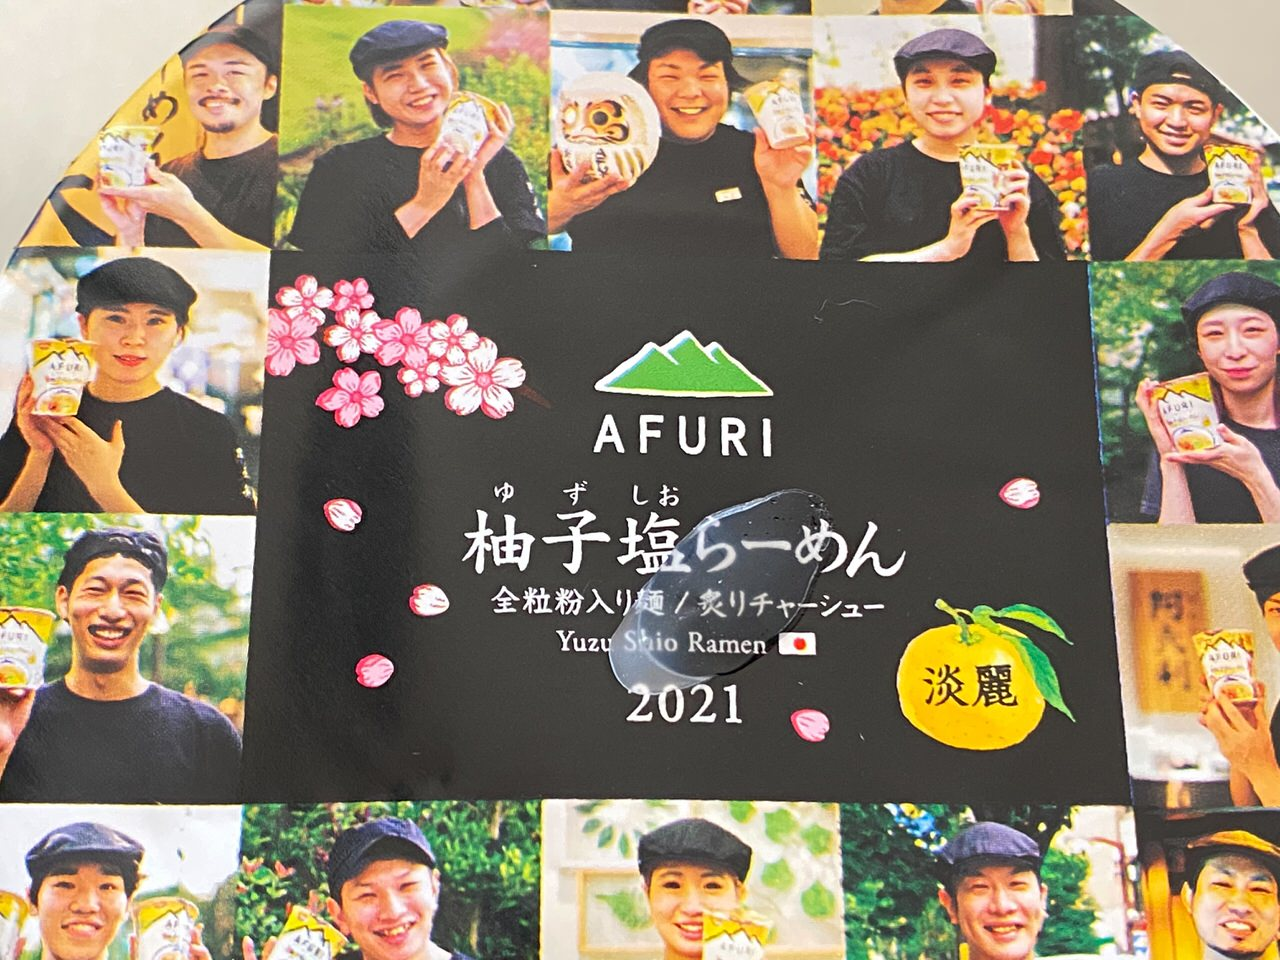 AFURI 春限定 柚子塩らーめん 淡麗(2021) 006 202103